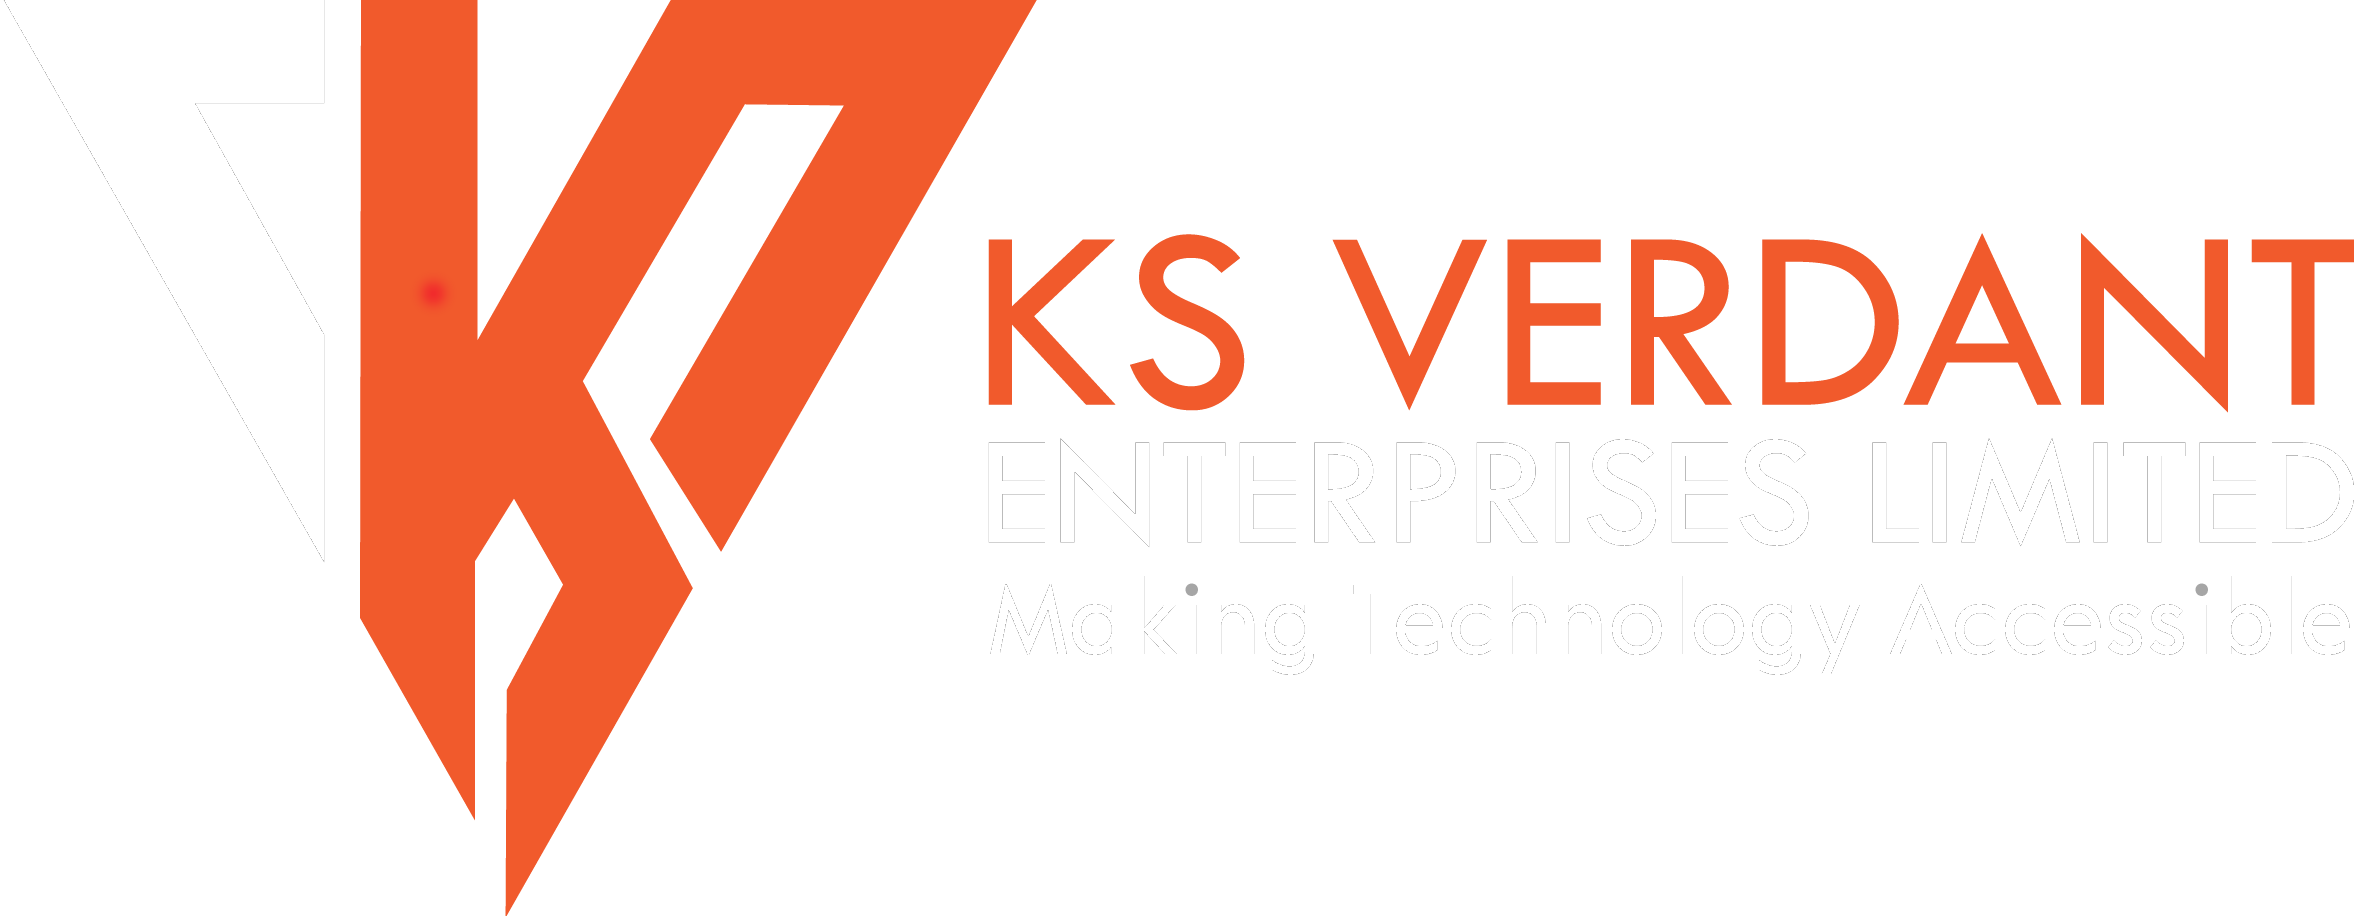 KS Verdant Enterprises Limited